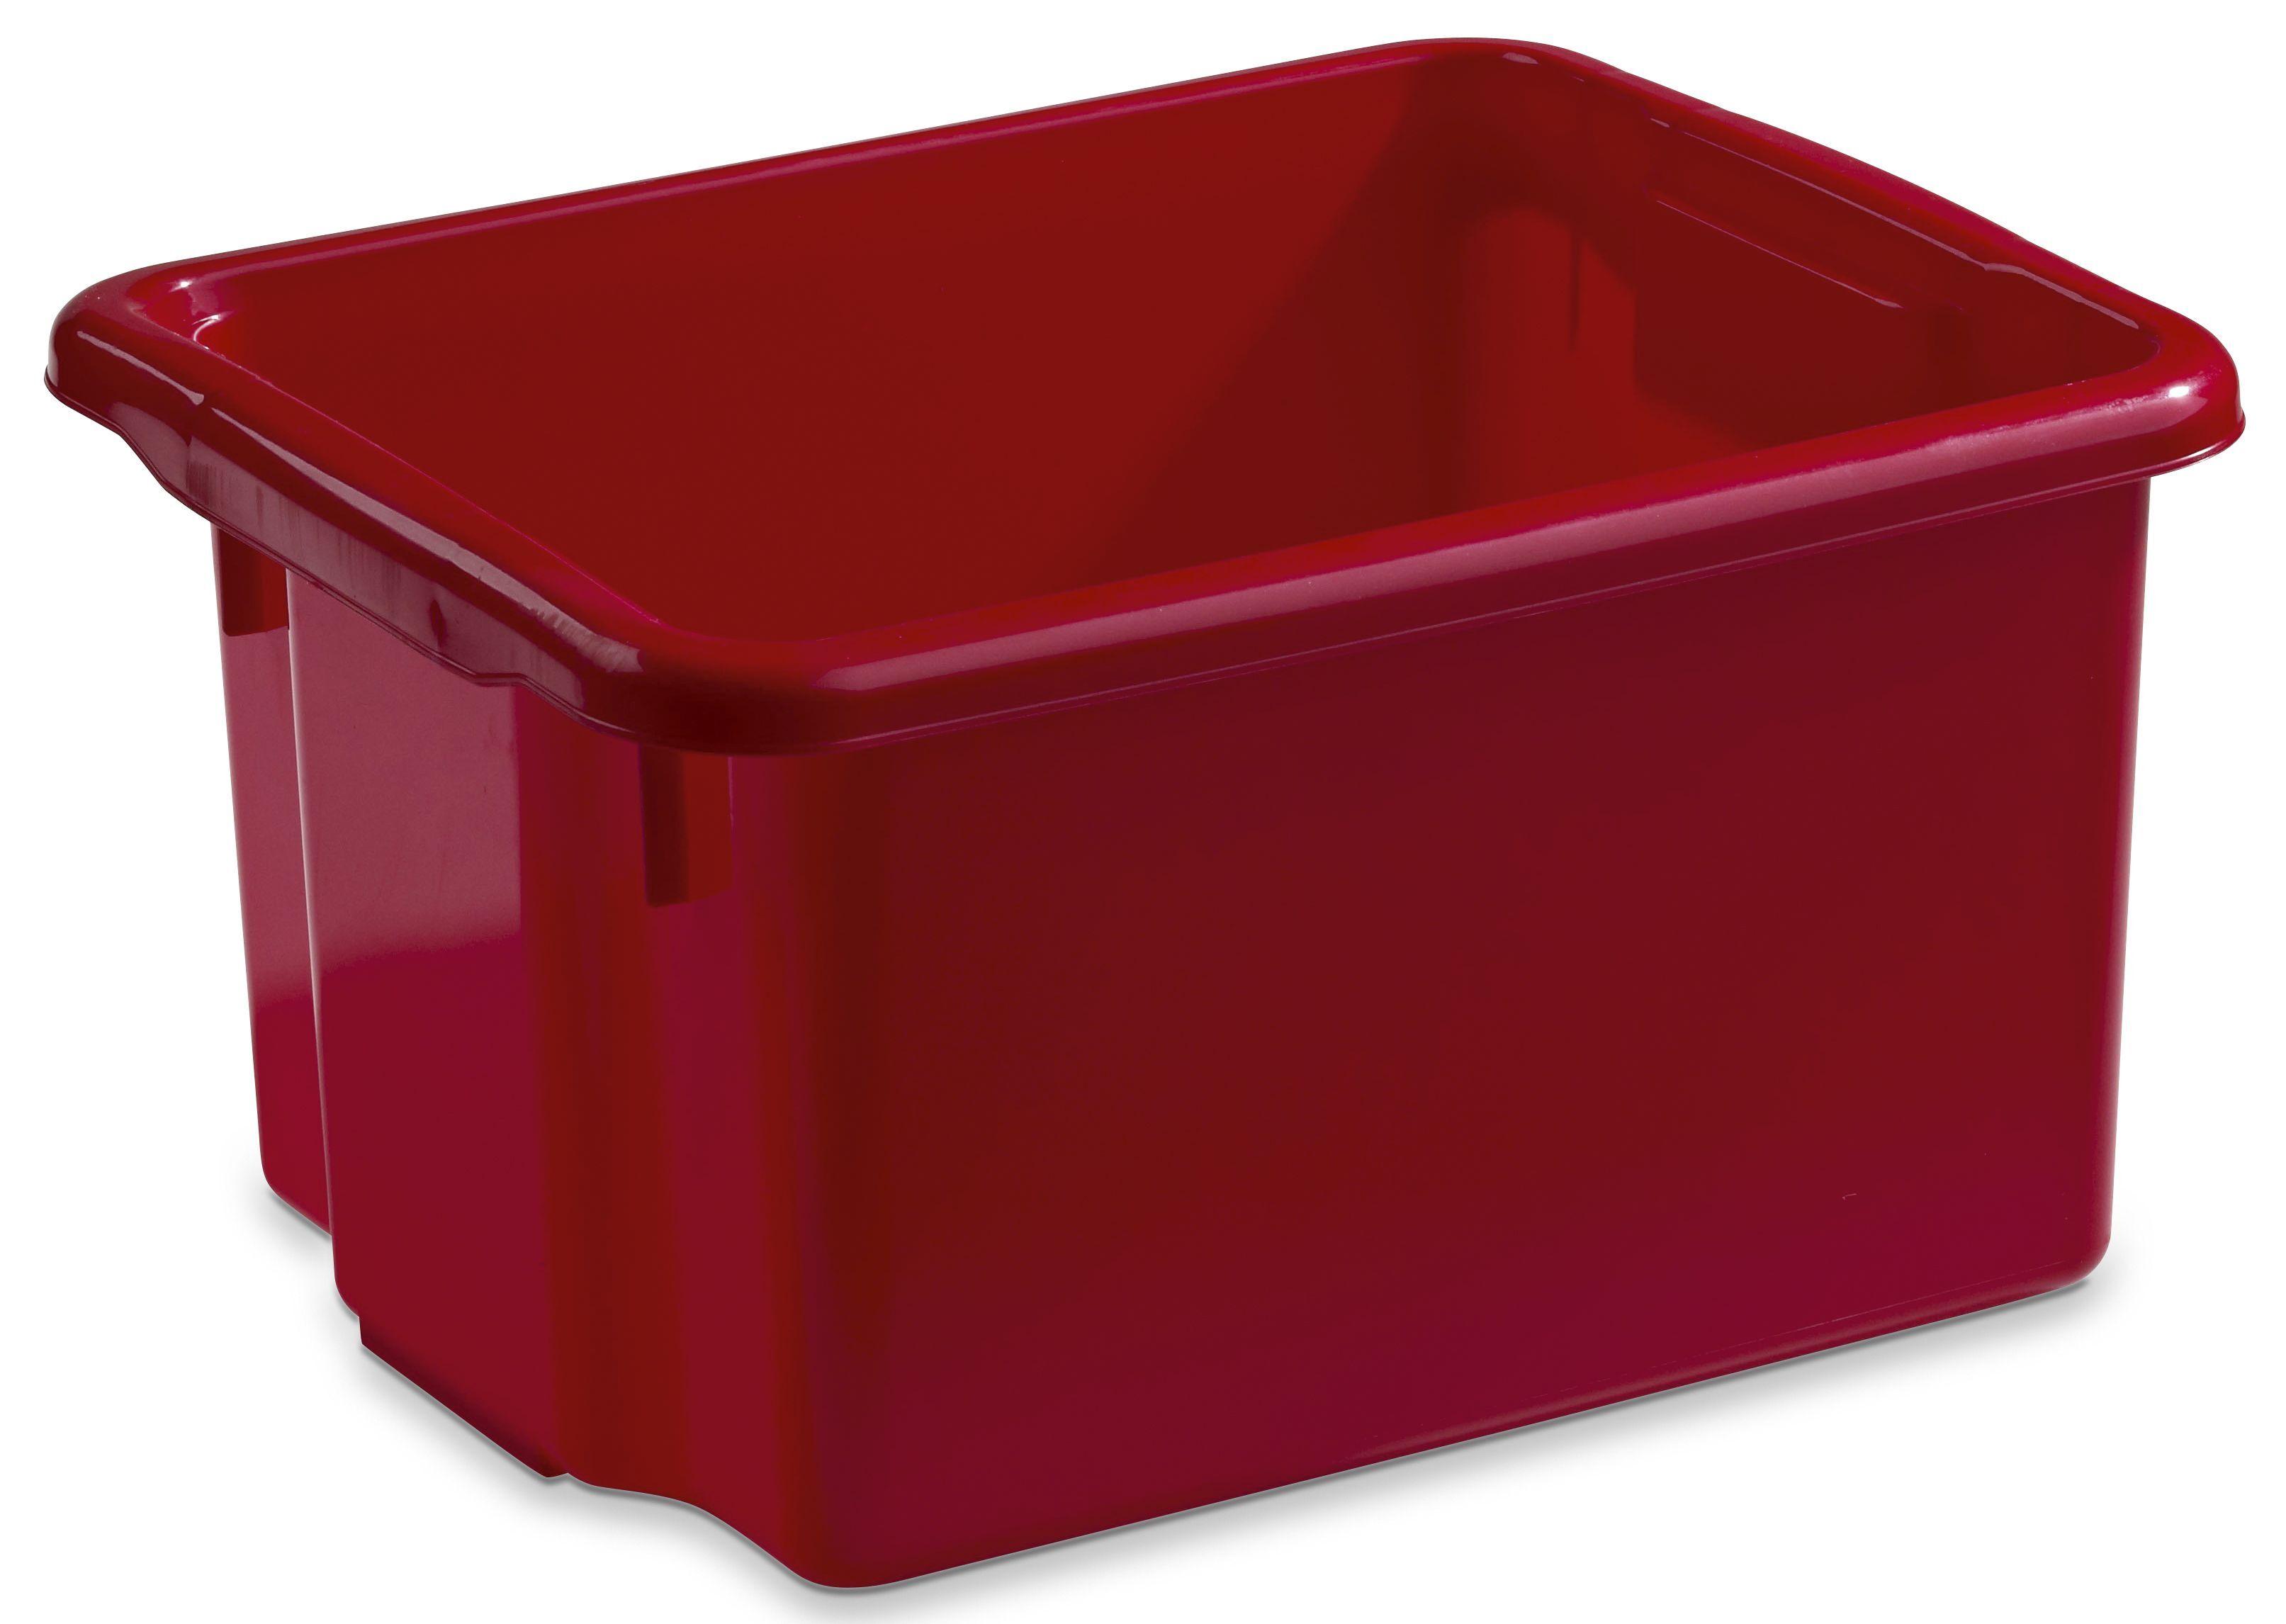 Nordiska 7150-0300 Nordiska Oppbevaringsboks PLAST 15L rød